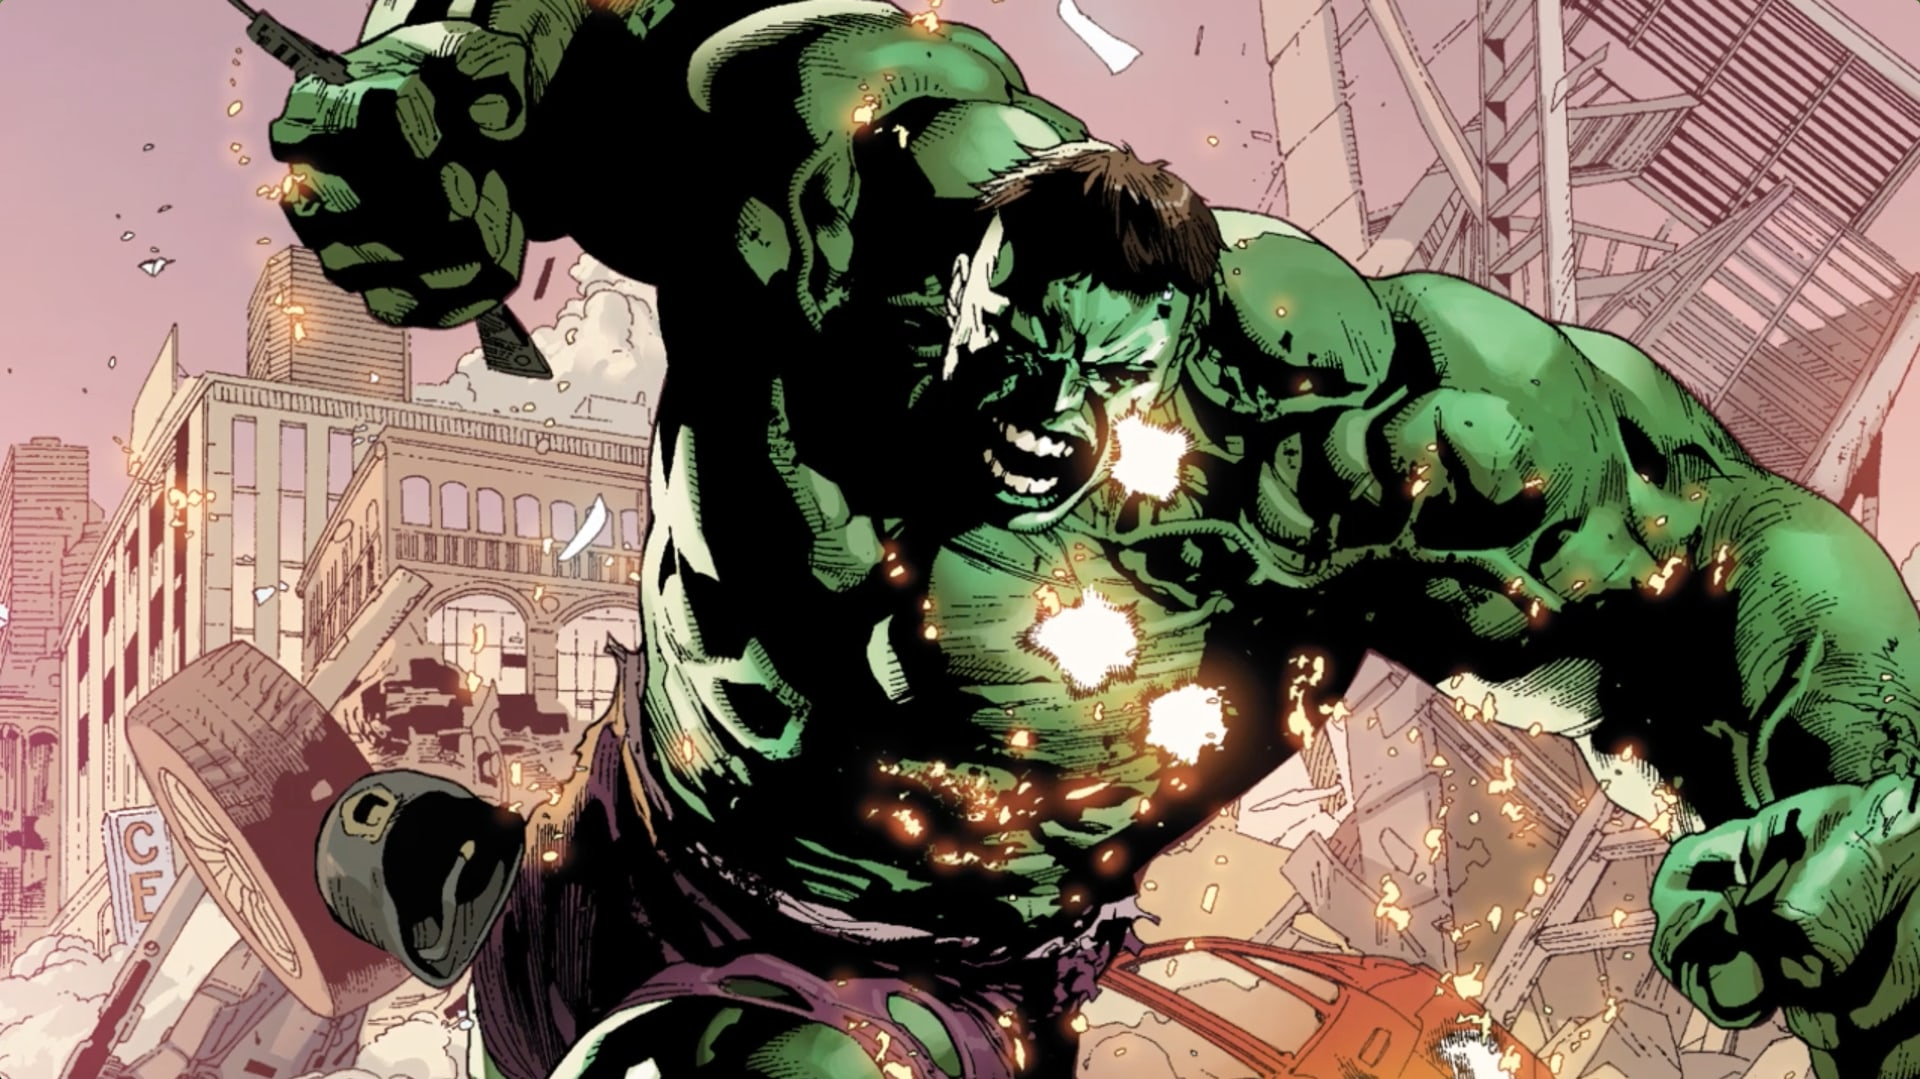 Hulk - Heróis em um minuto